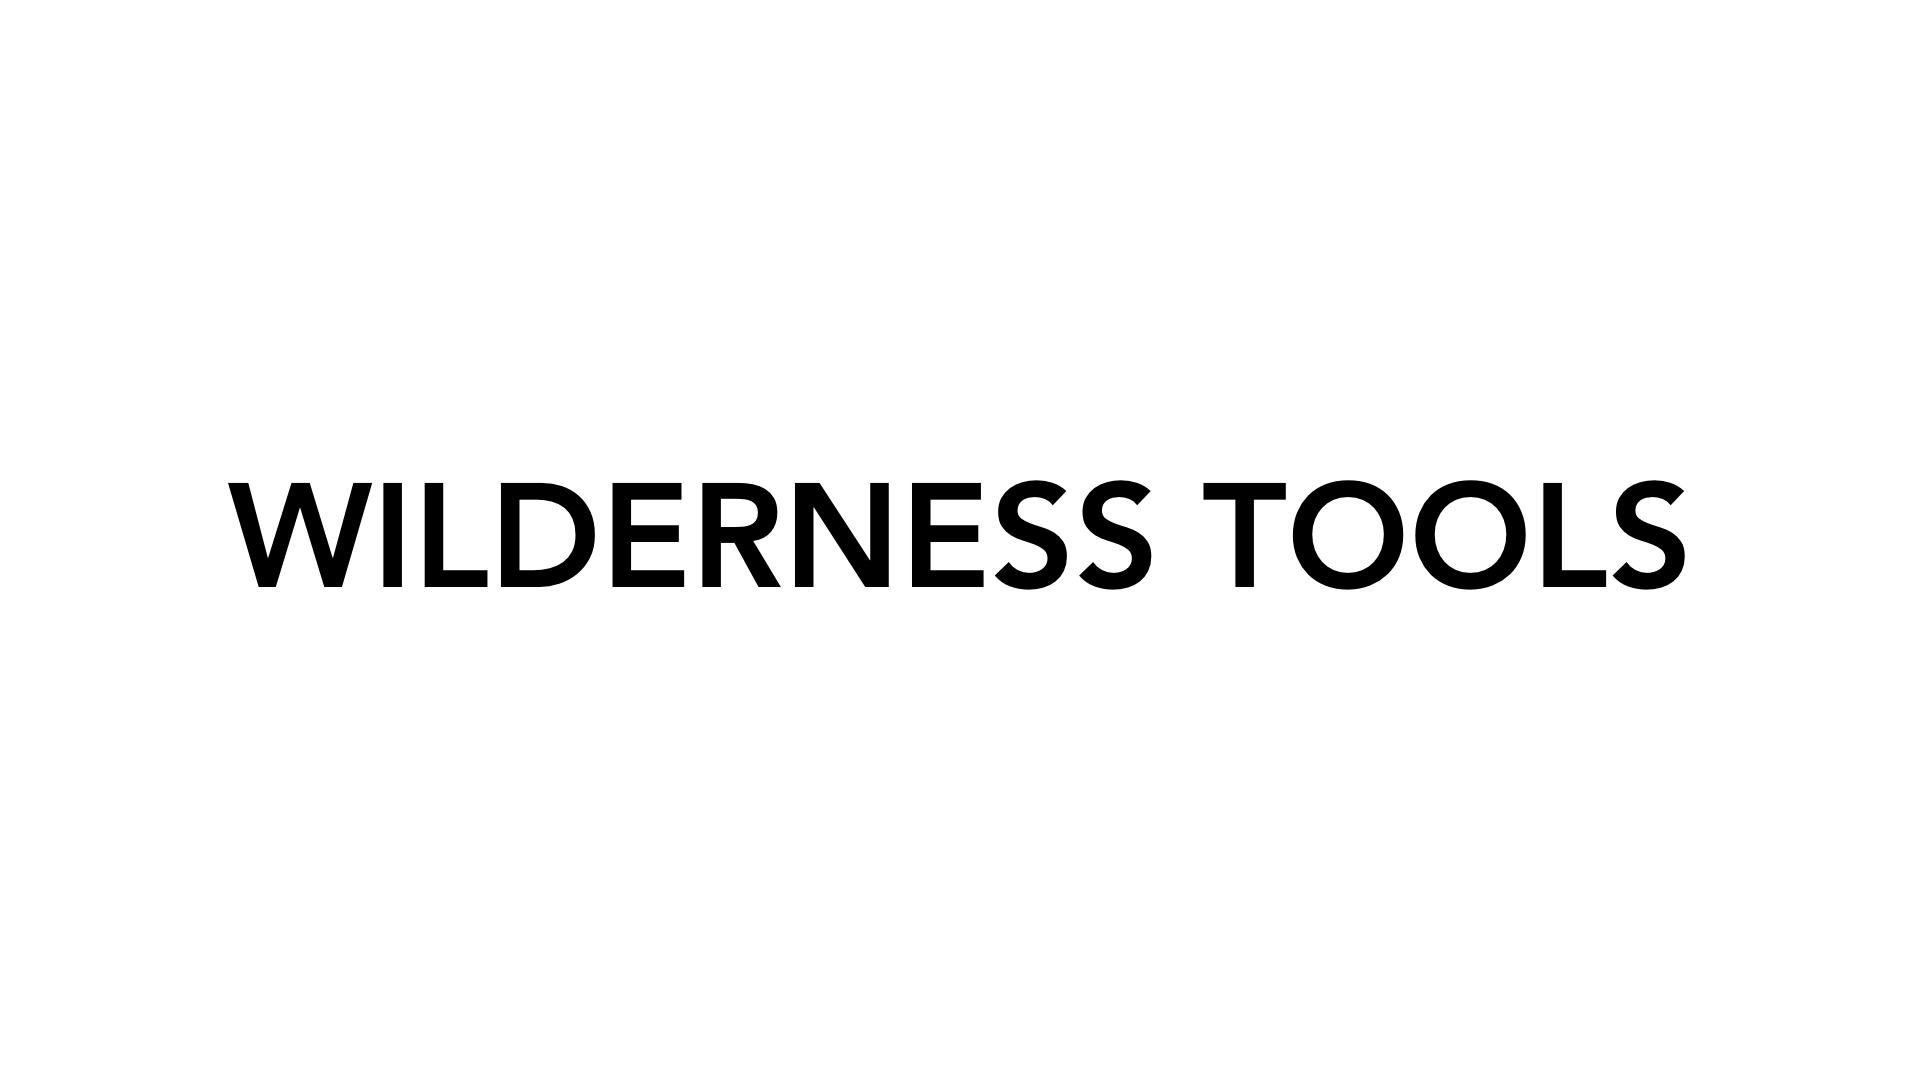 WILDERNESS-Maxlackner.015.jpeg